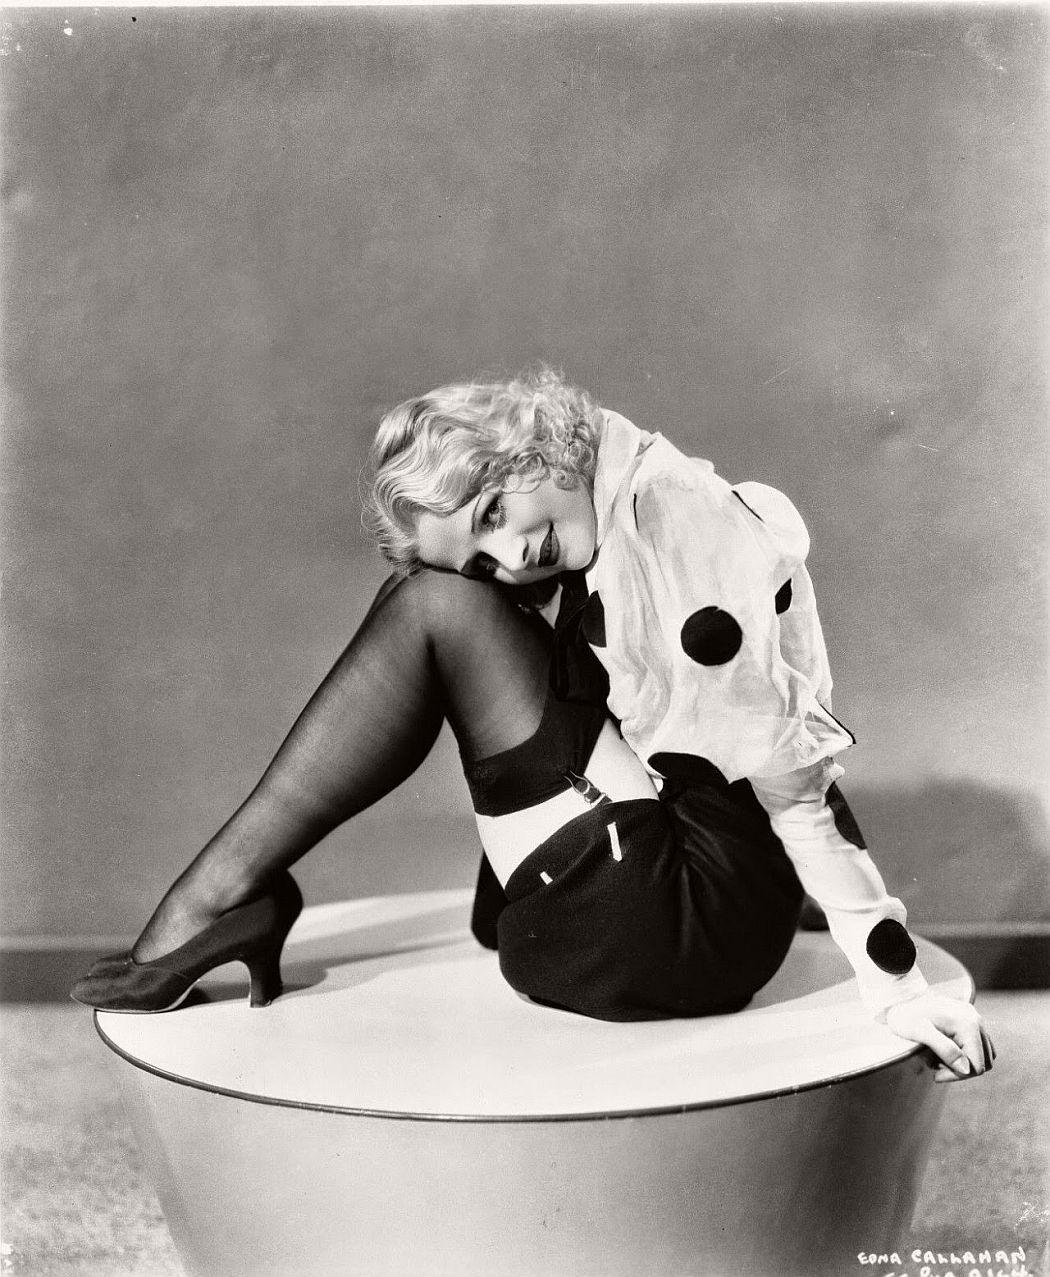 vintage-black-white-portrait-hollywood-movie-actress-1930s-Edna-Callahan